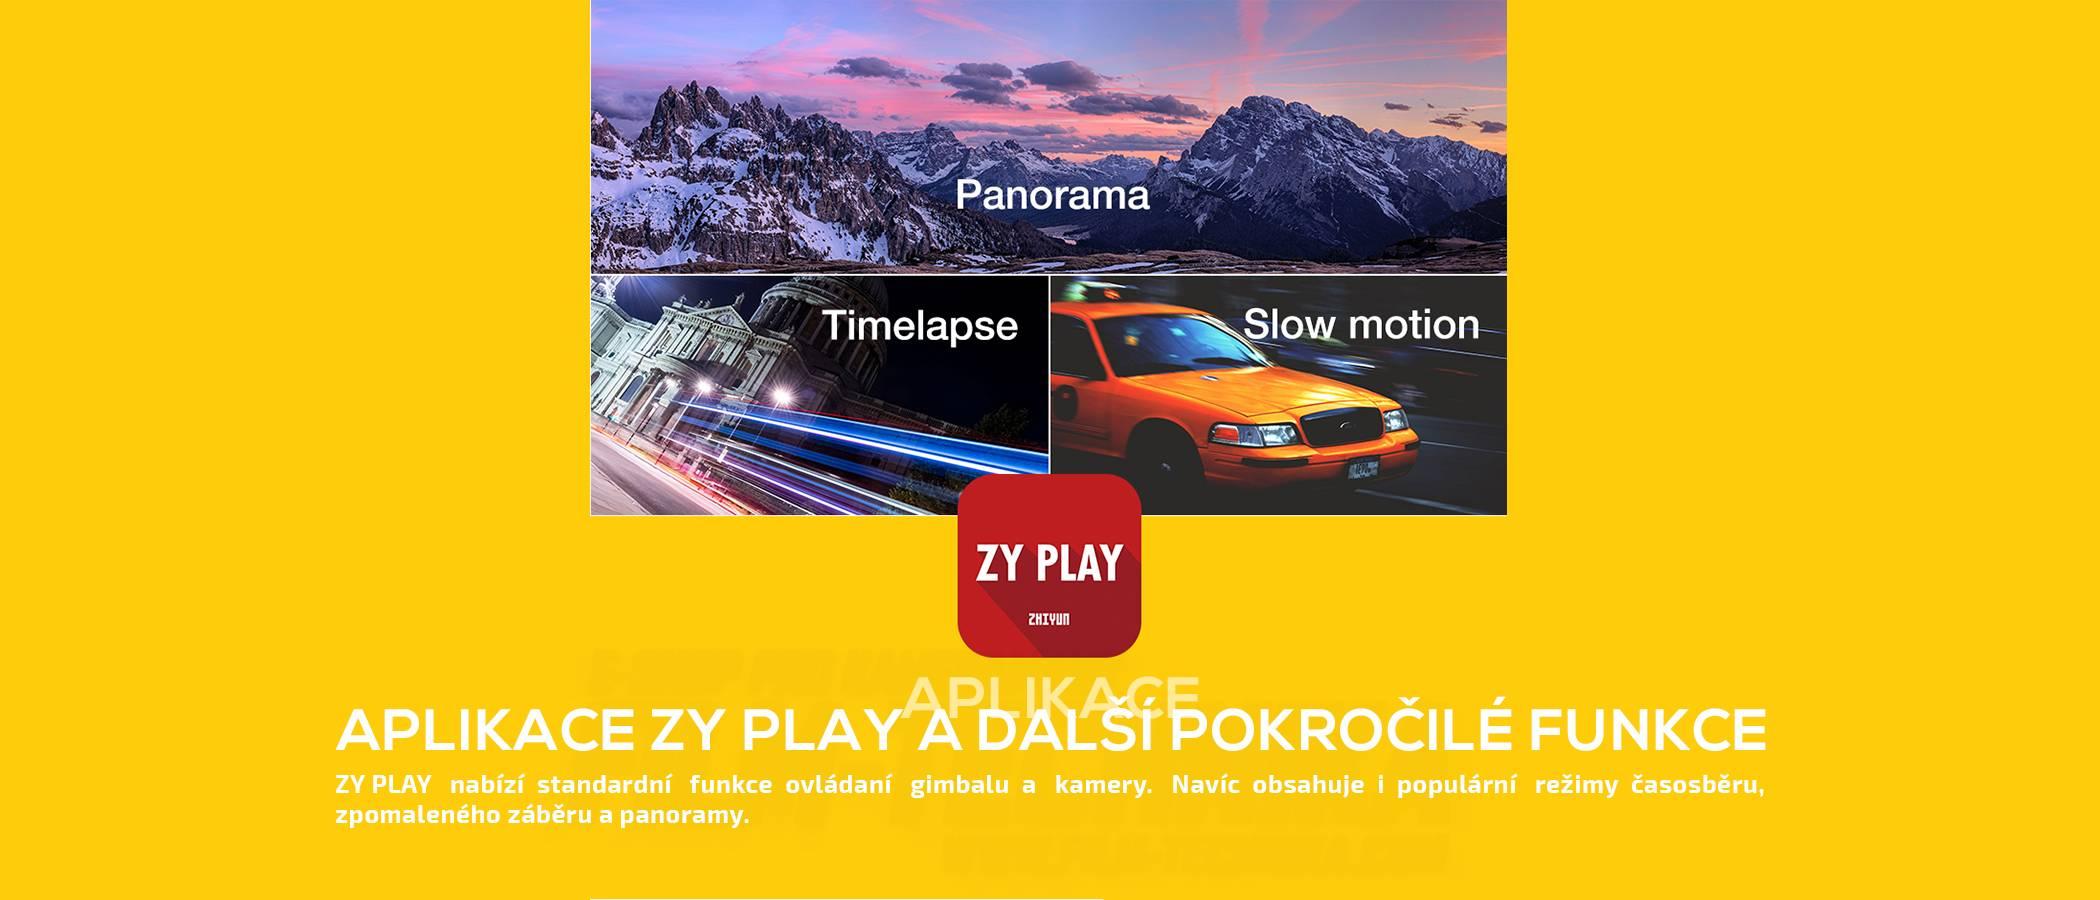 film-technika-zhiyun-m2-gimbal-aplikace